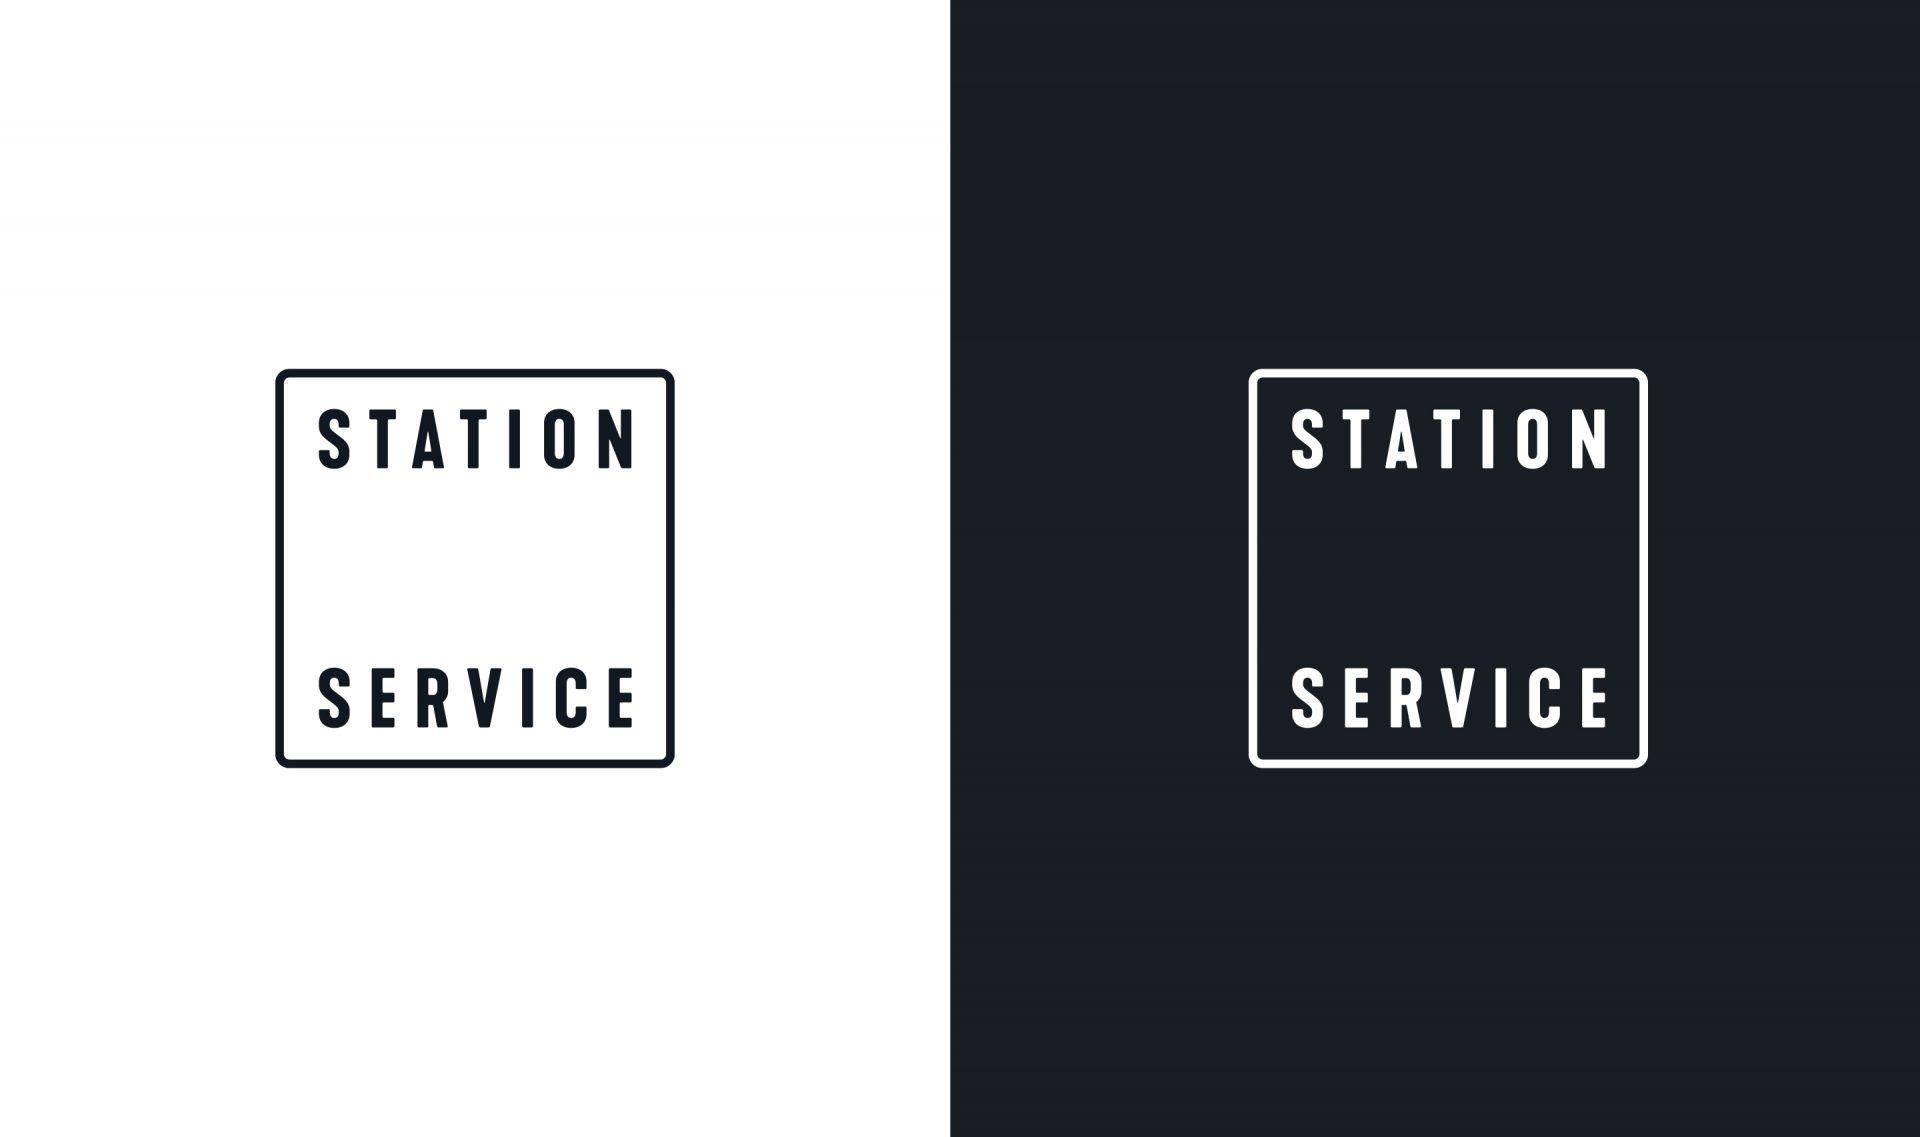 Station Service by Park Avenue